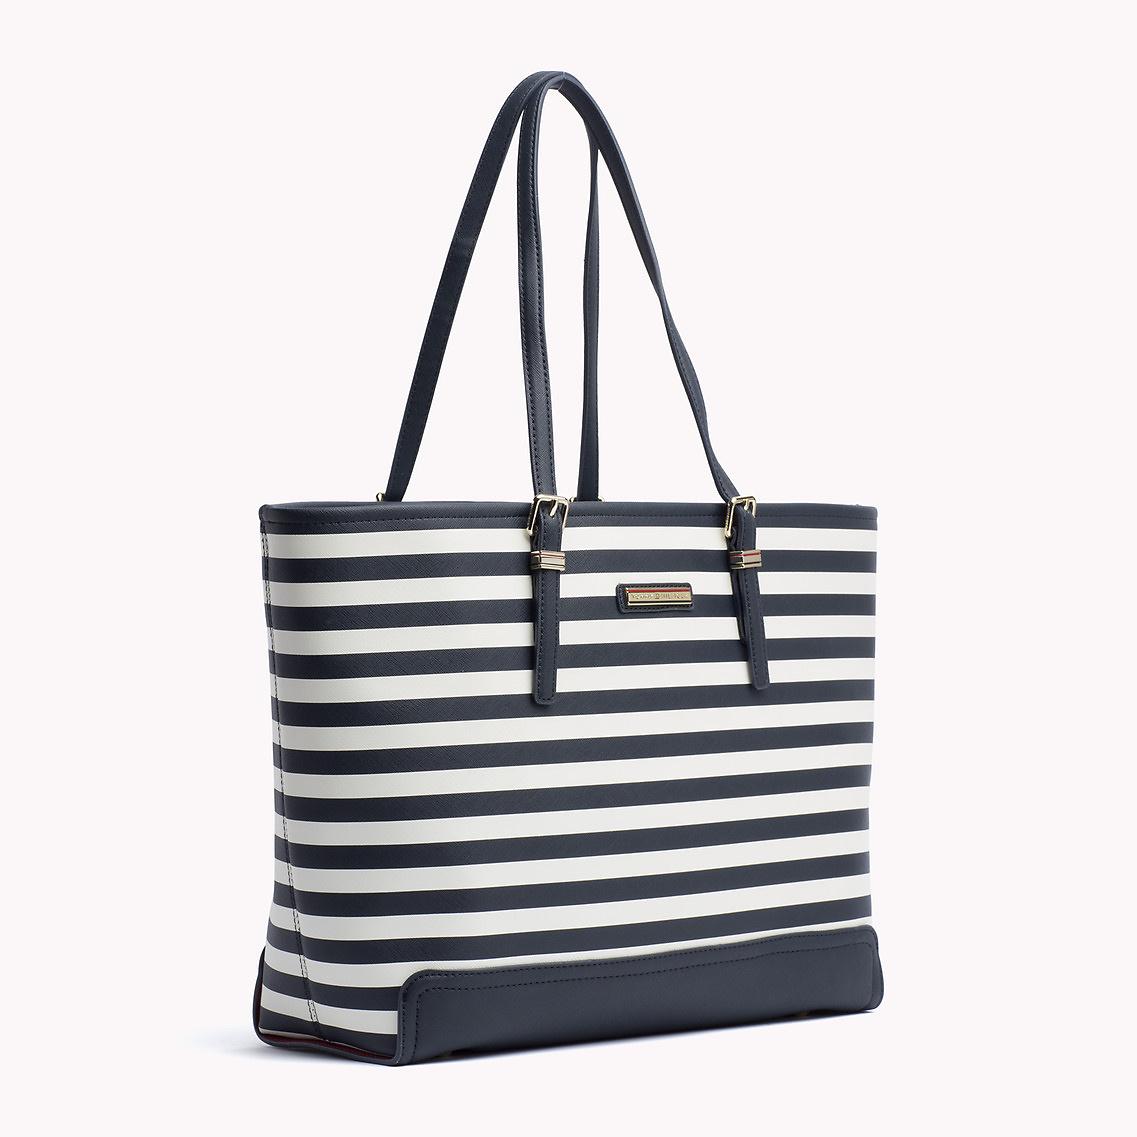 Psp Travel Bag